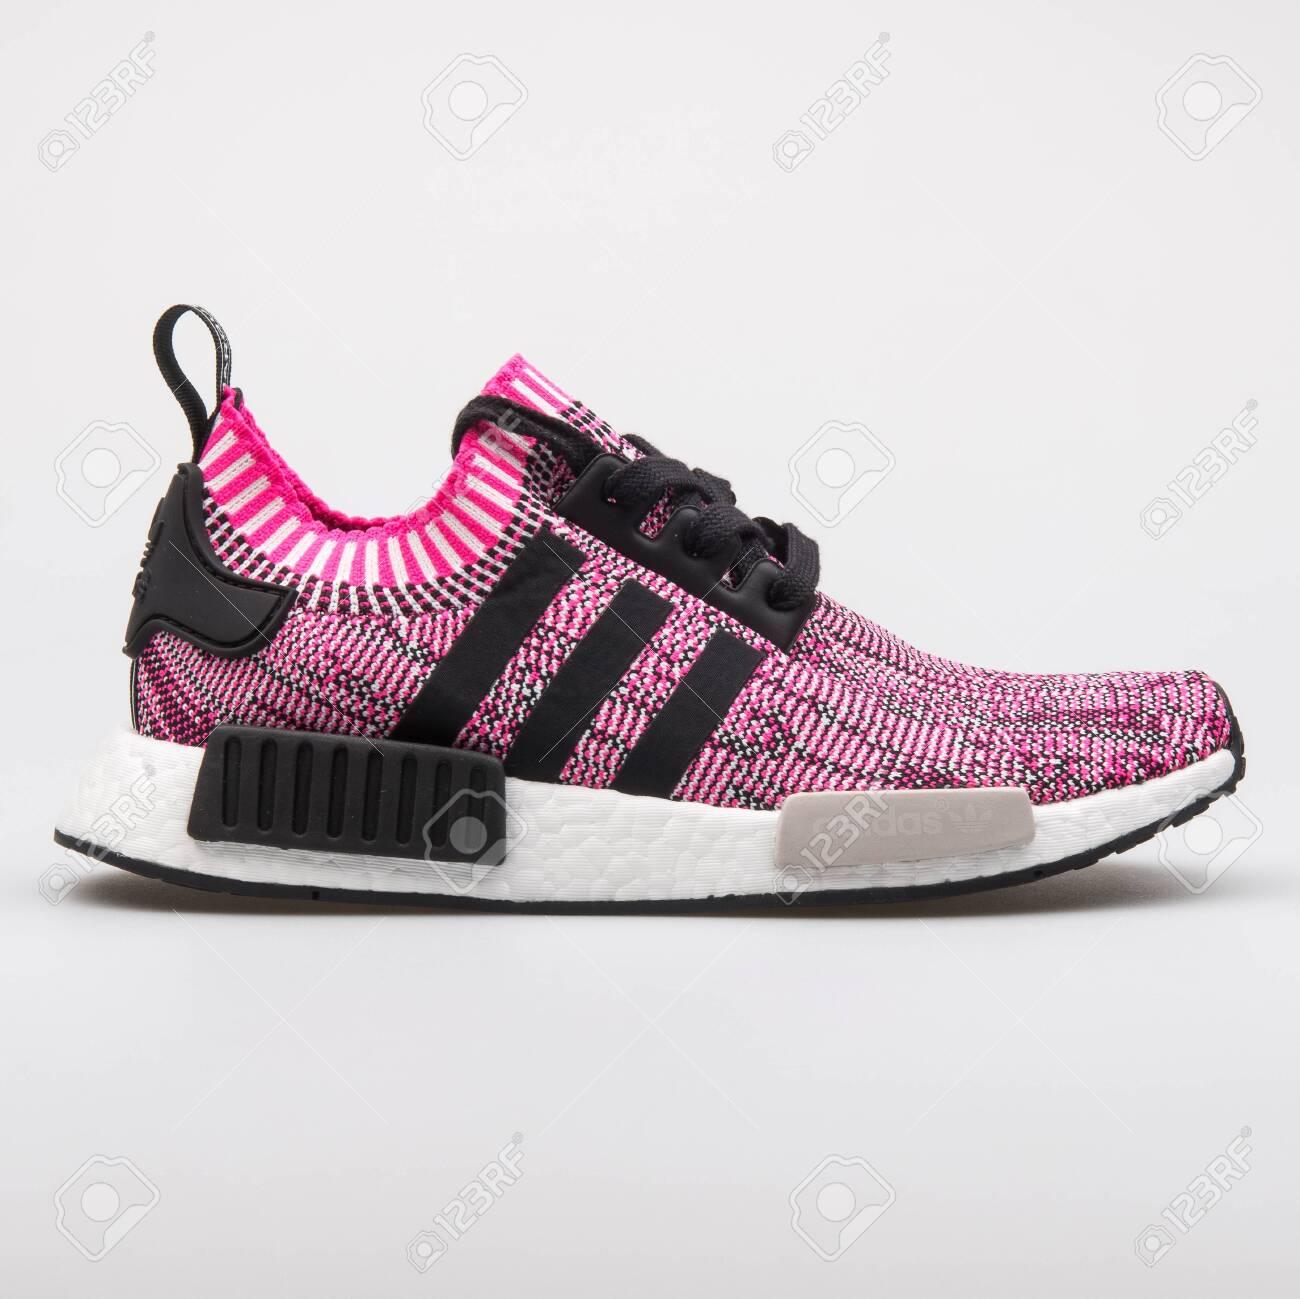 Adidas NMD R1 PK Pink Sneaker.. Stock